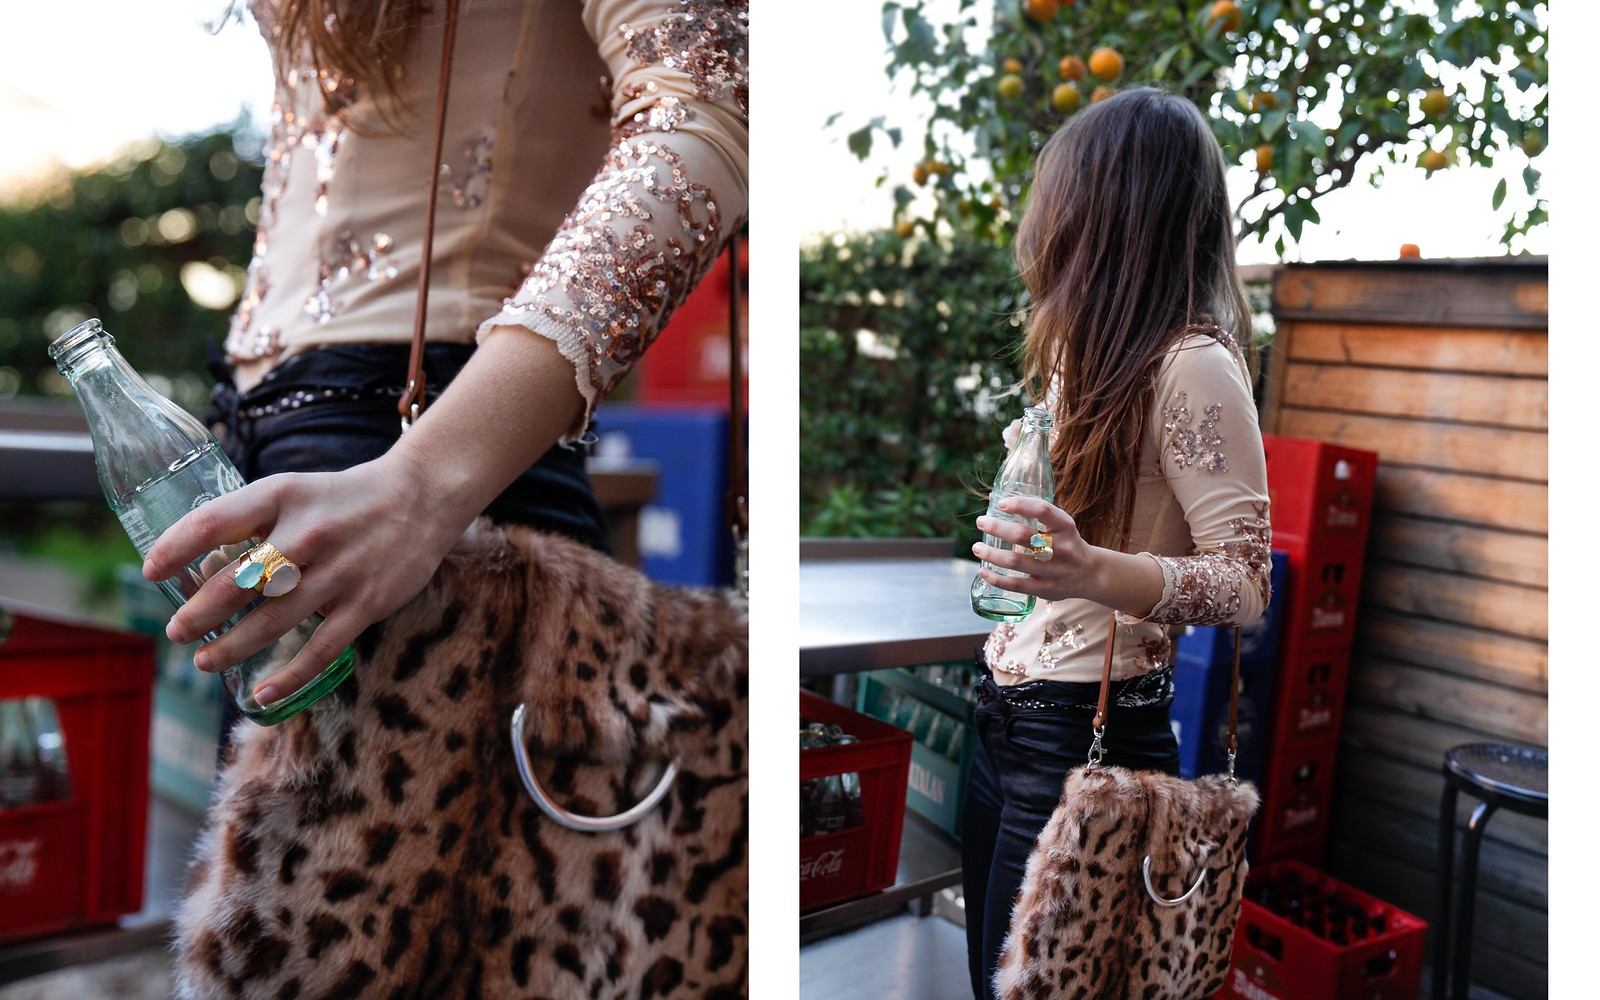 010_Sequin_Body_Nihgt_outfit_Danity_Paris_theguestgirl